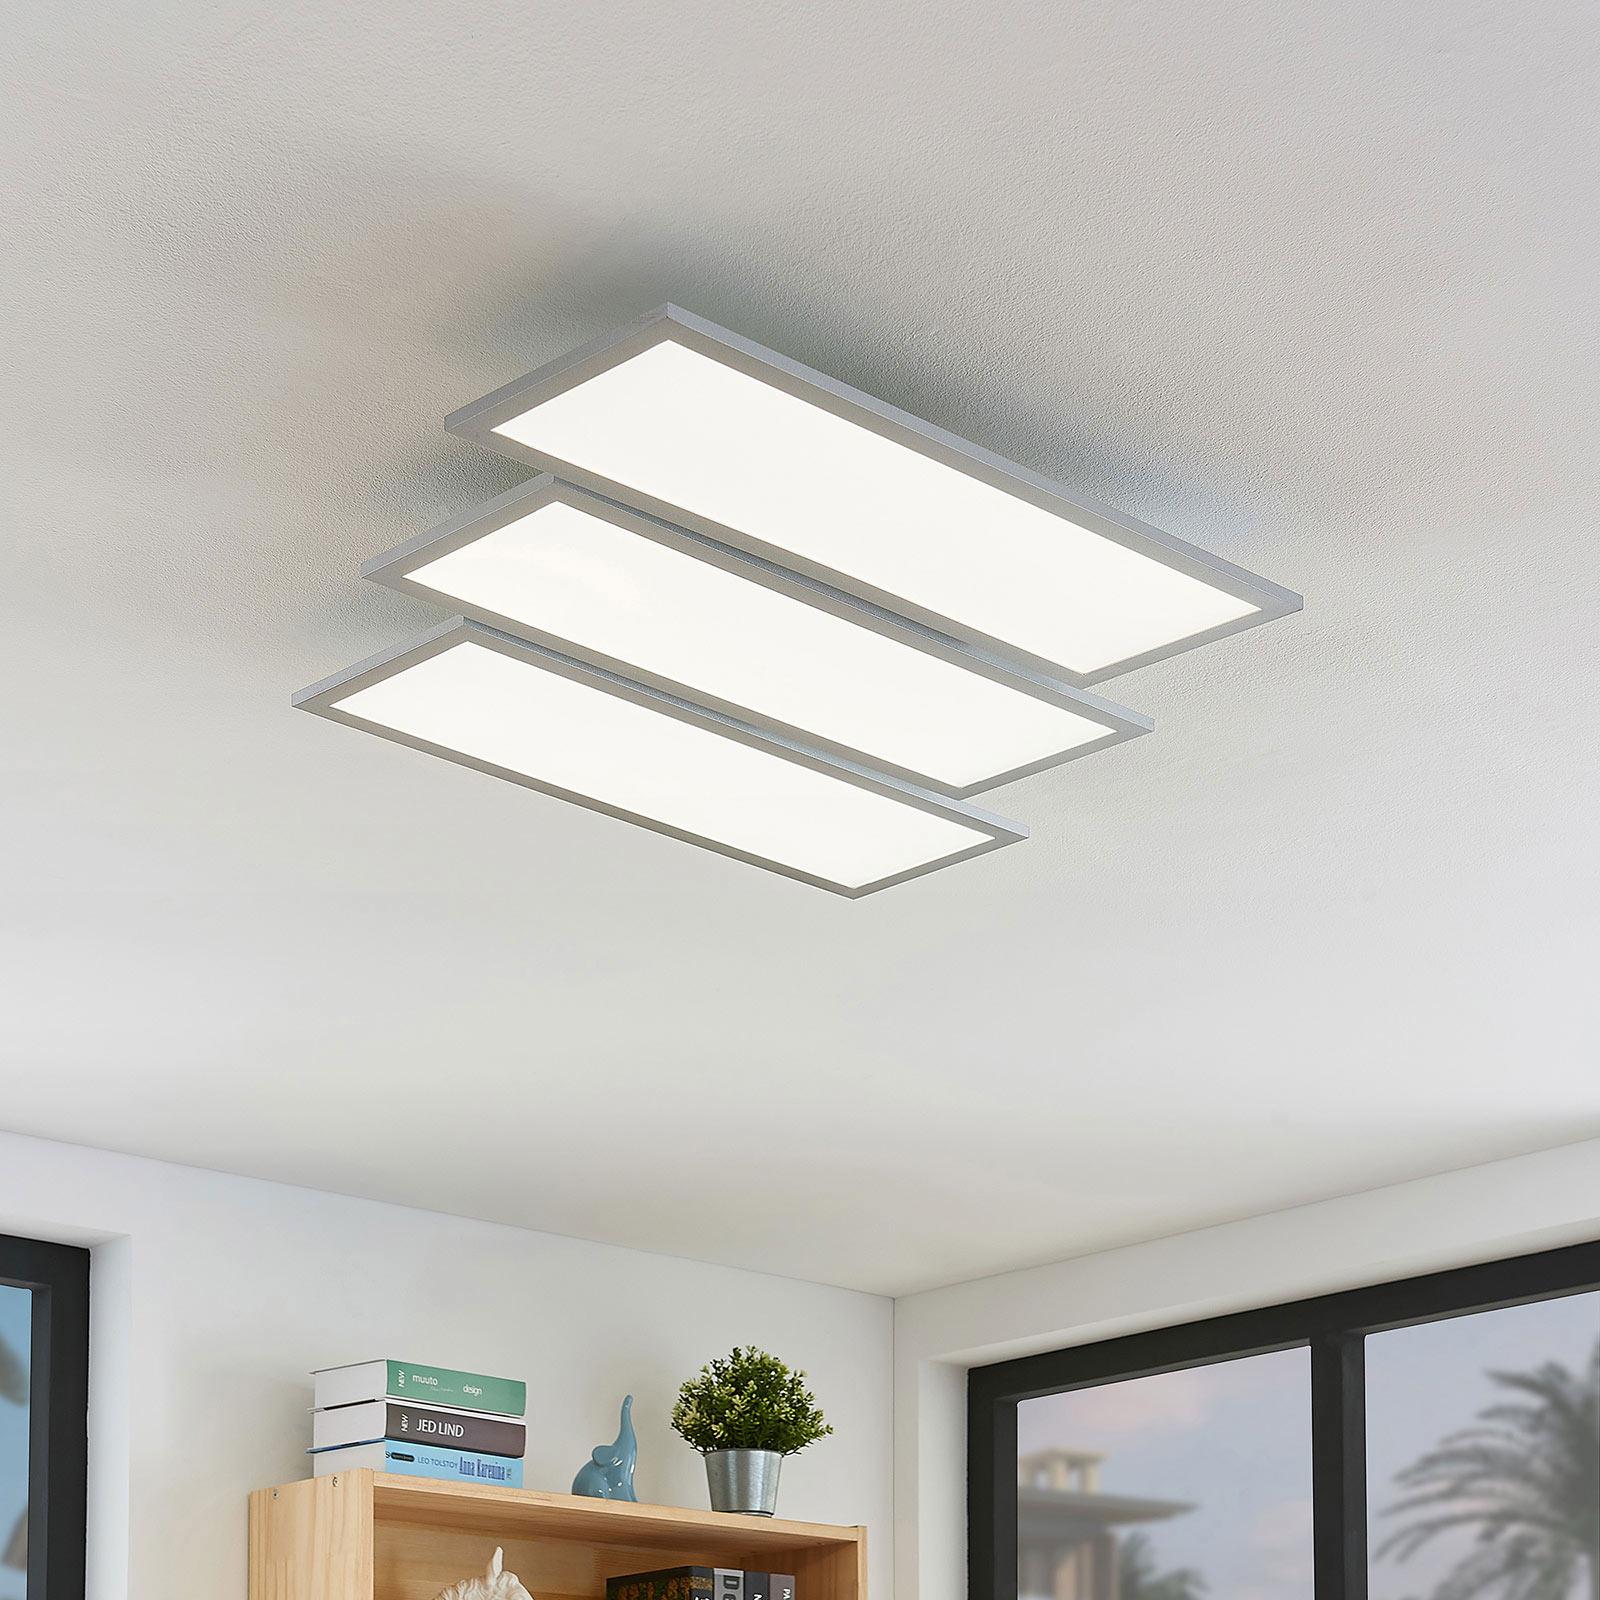 Lampa sufitowa LED Florin, ściemniana, CCT, 3-pkt.